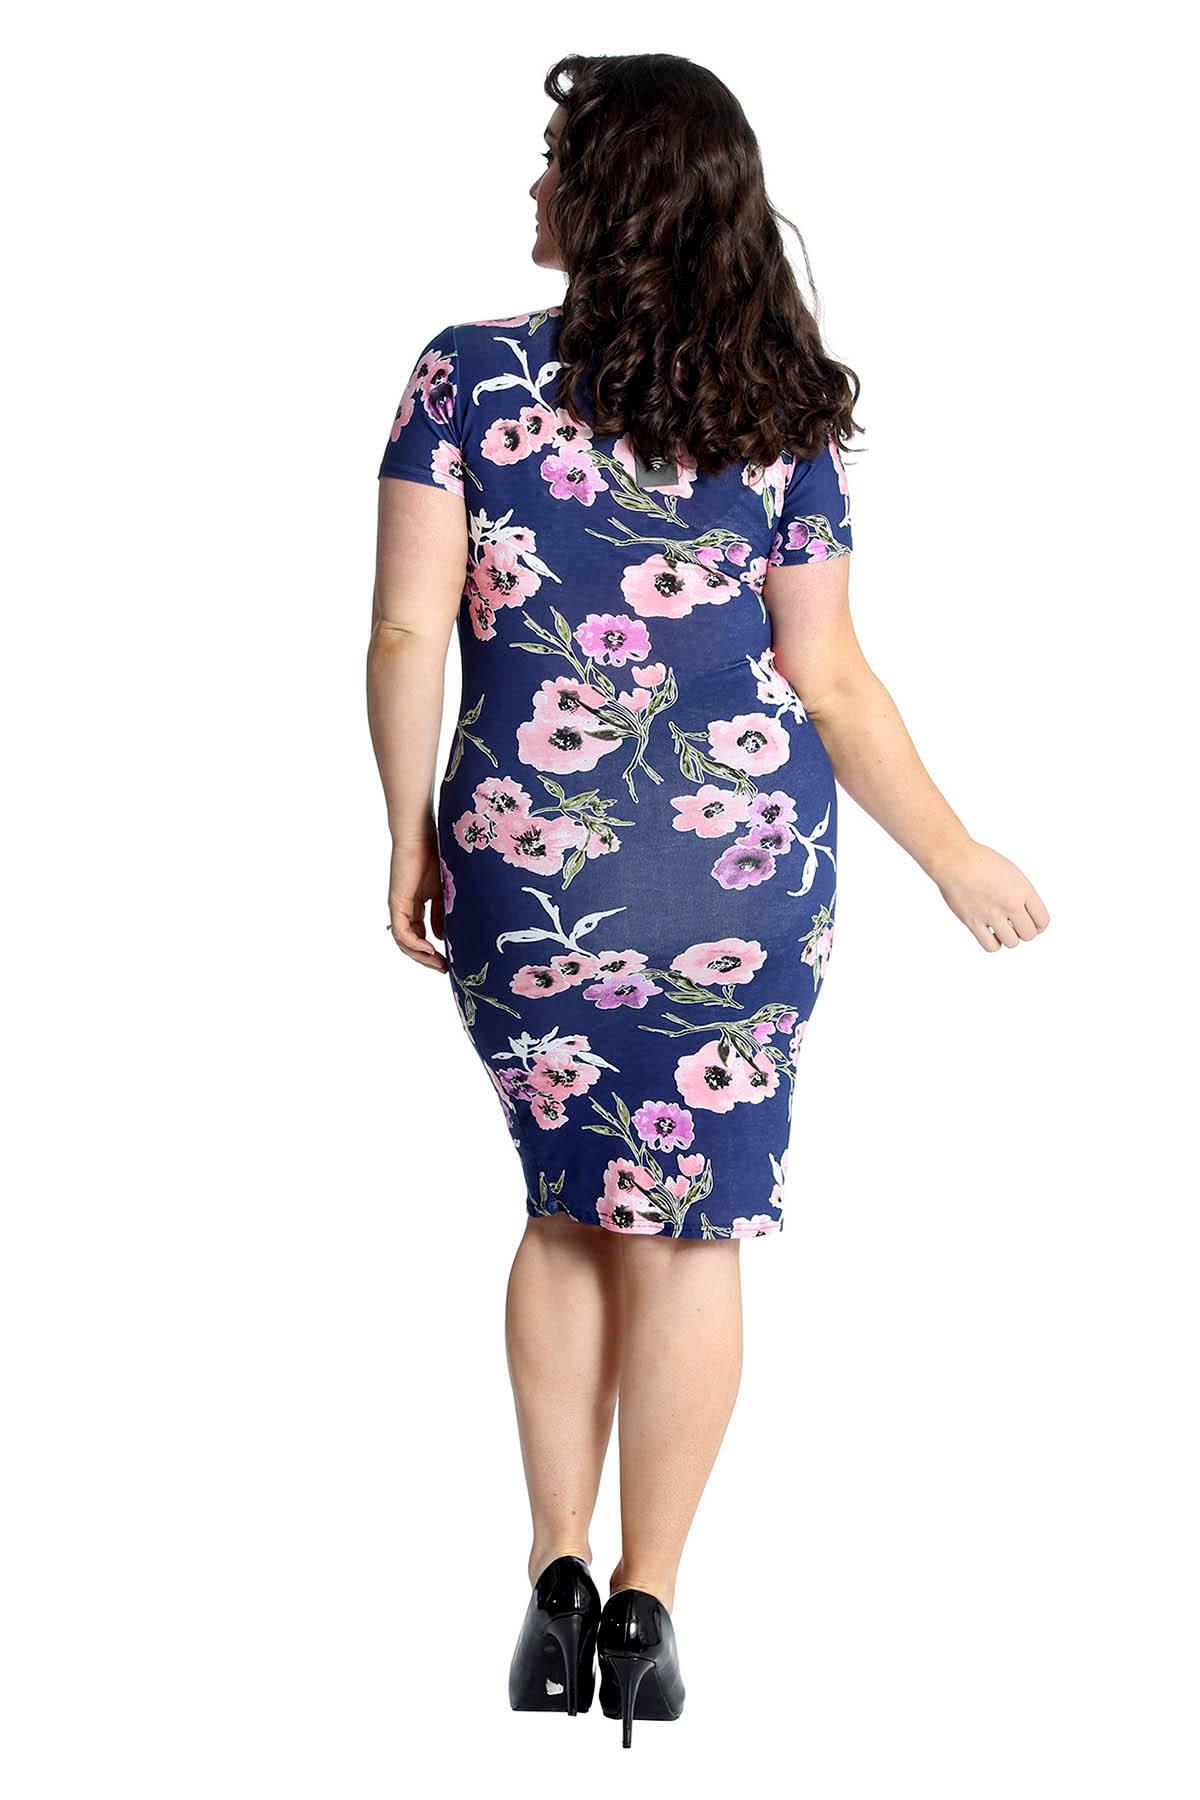 Neu Damen Übergröße Kleid Damen Bodycon Midi Floral Print